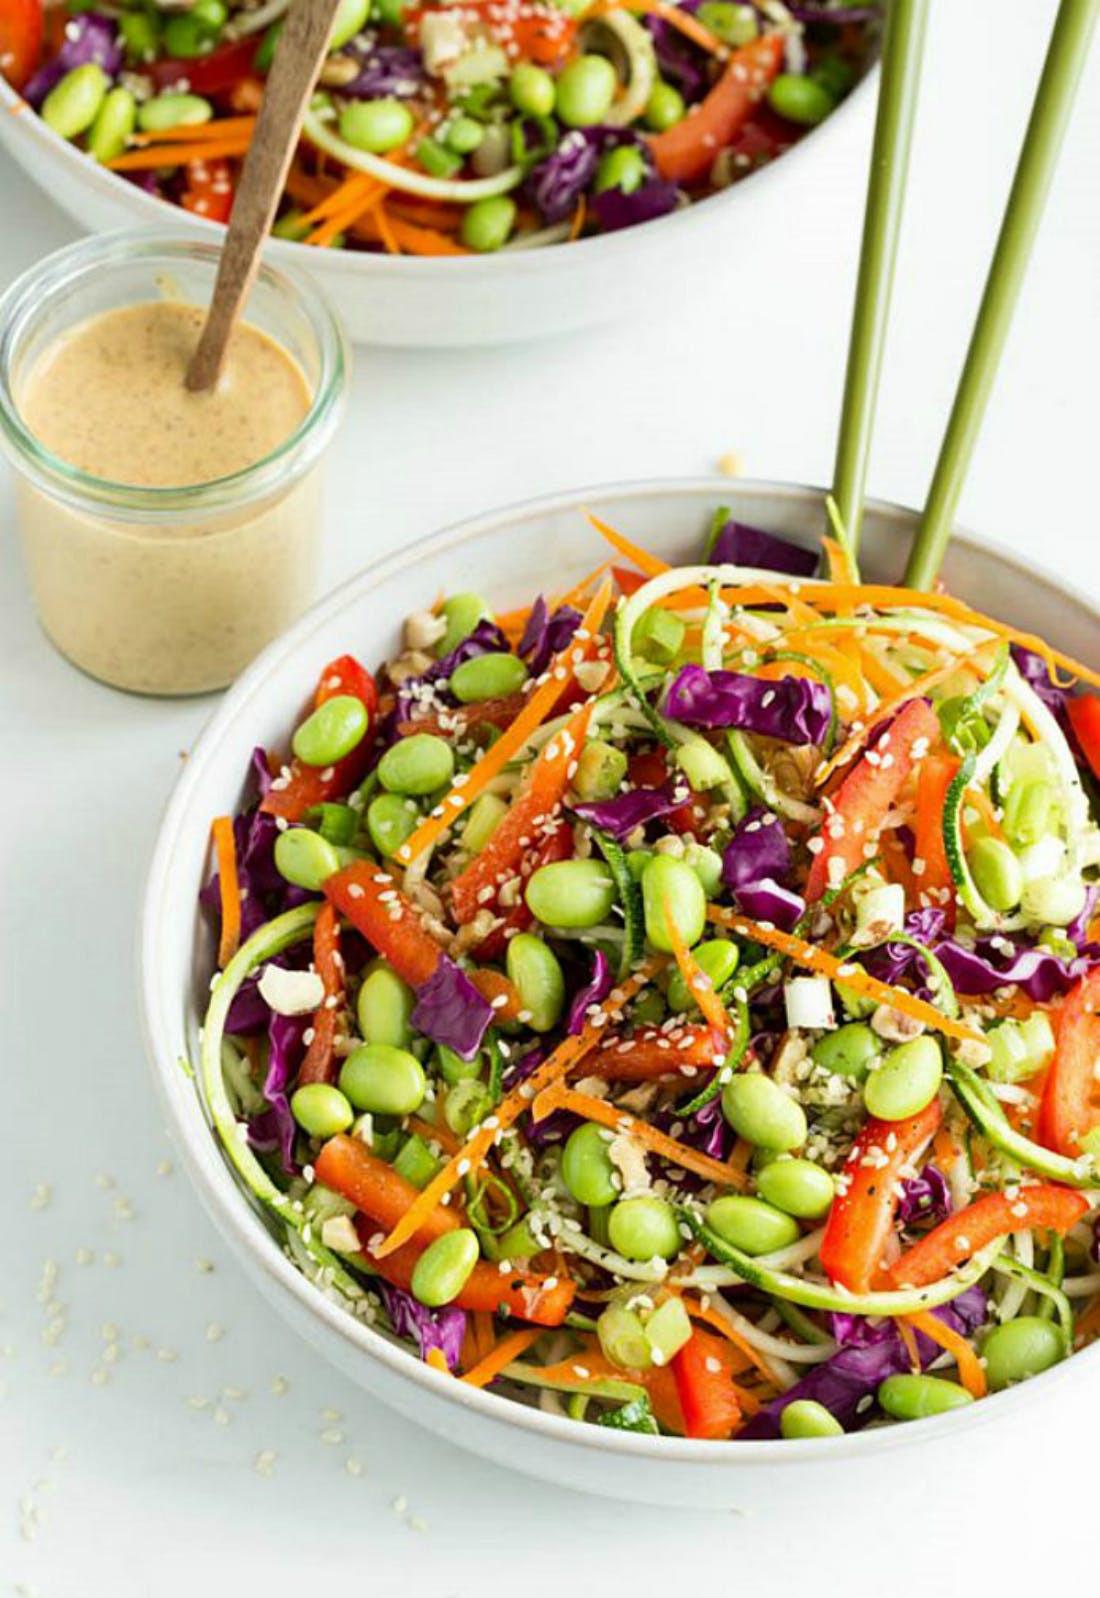 Healthy Raw Vegan Recipes  16 Raw Vegan Recipes You're Craving Right Now